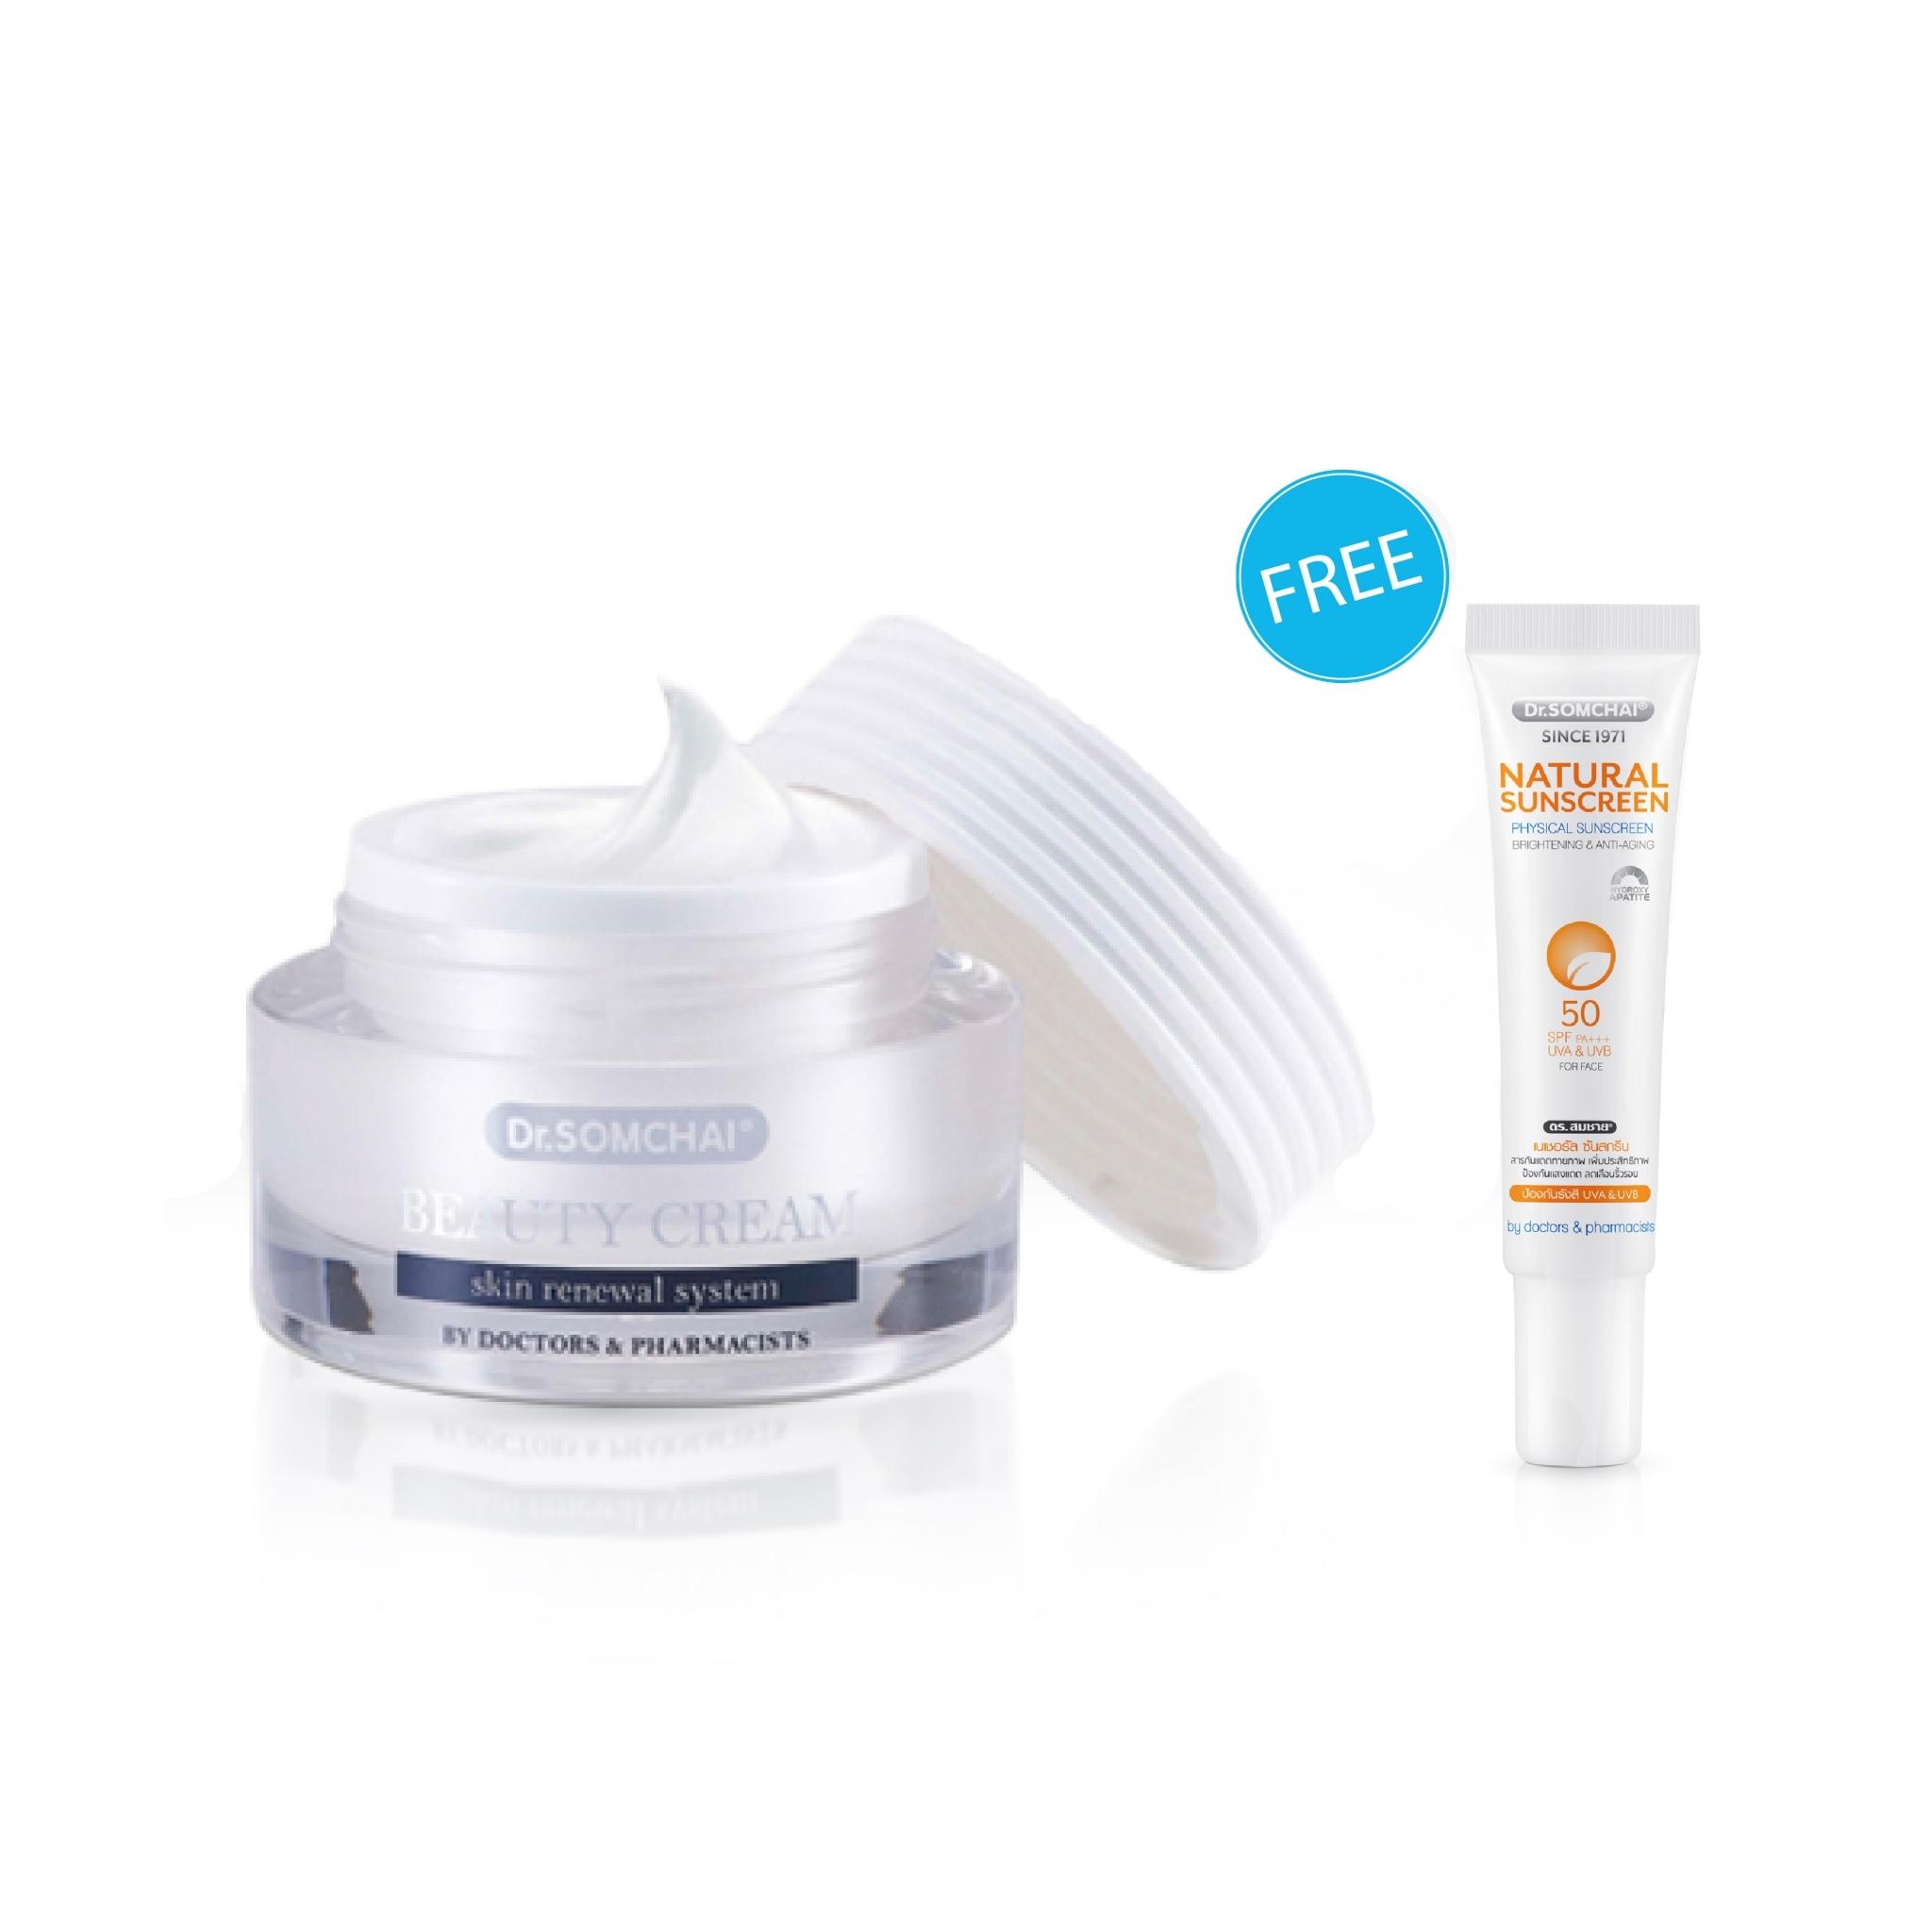 Festive Beauty Cream | ดร.สมชาย